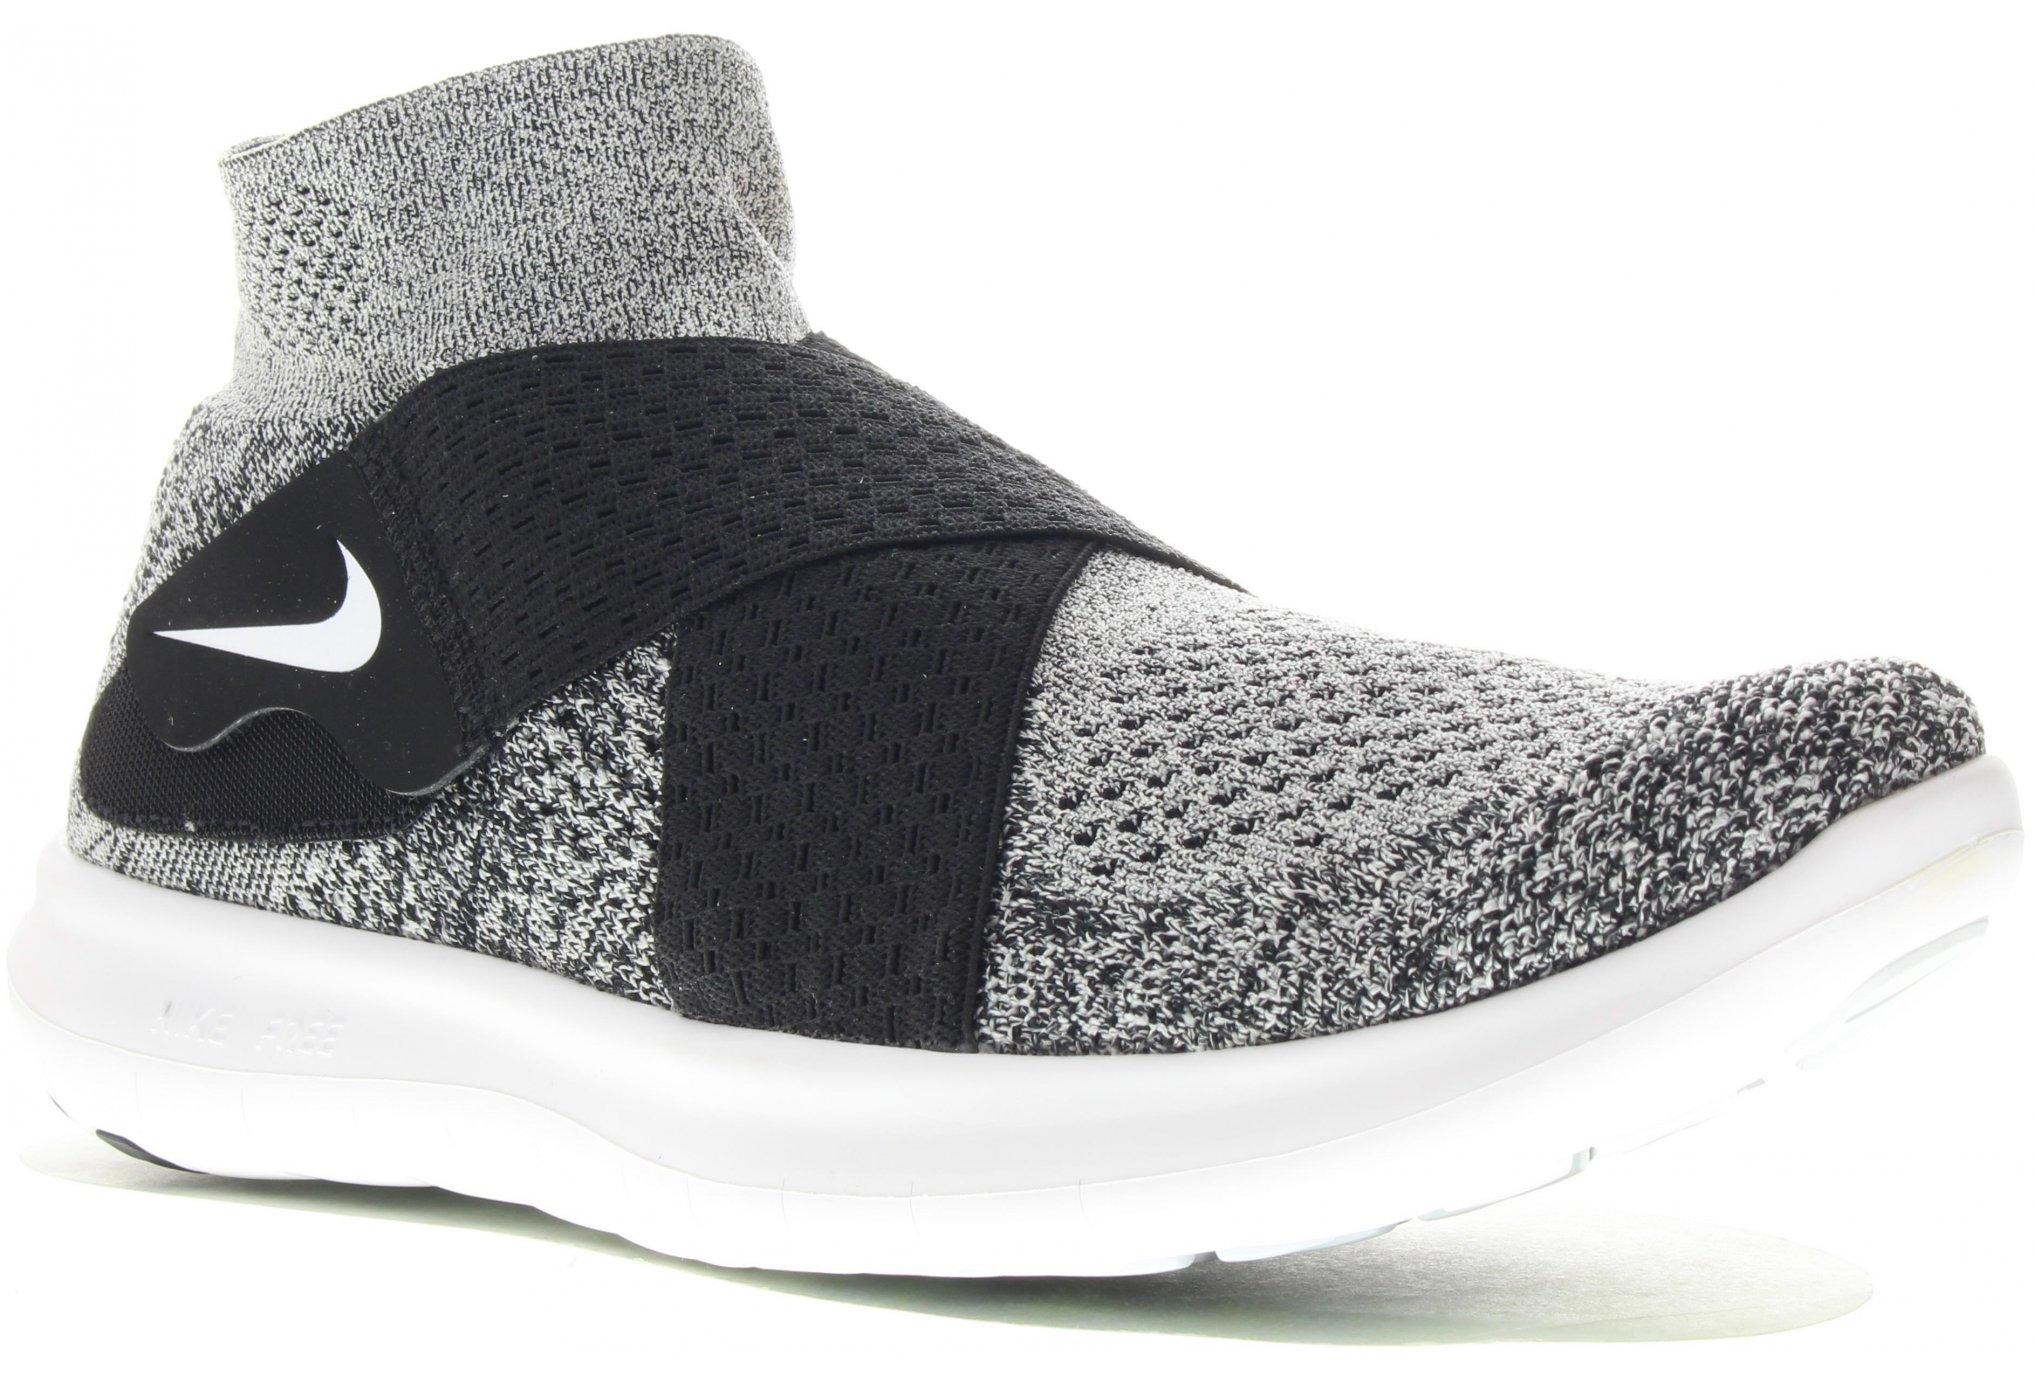 Nike Free RN Motion Flyknit 2017 M Diététique Chaussures homme